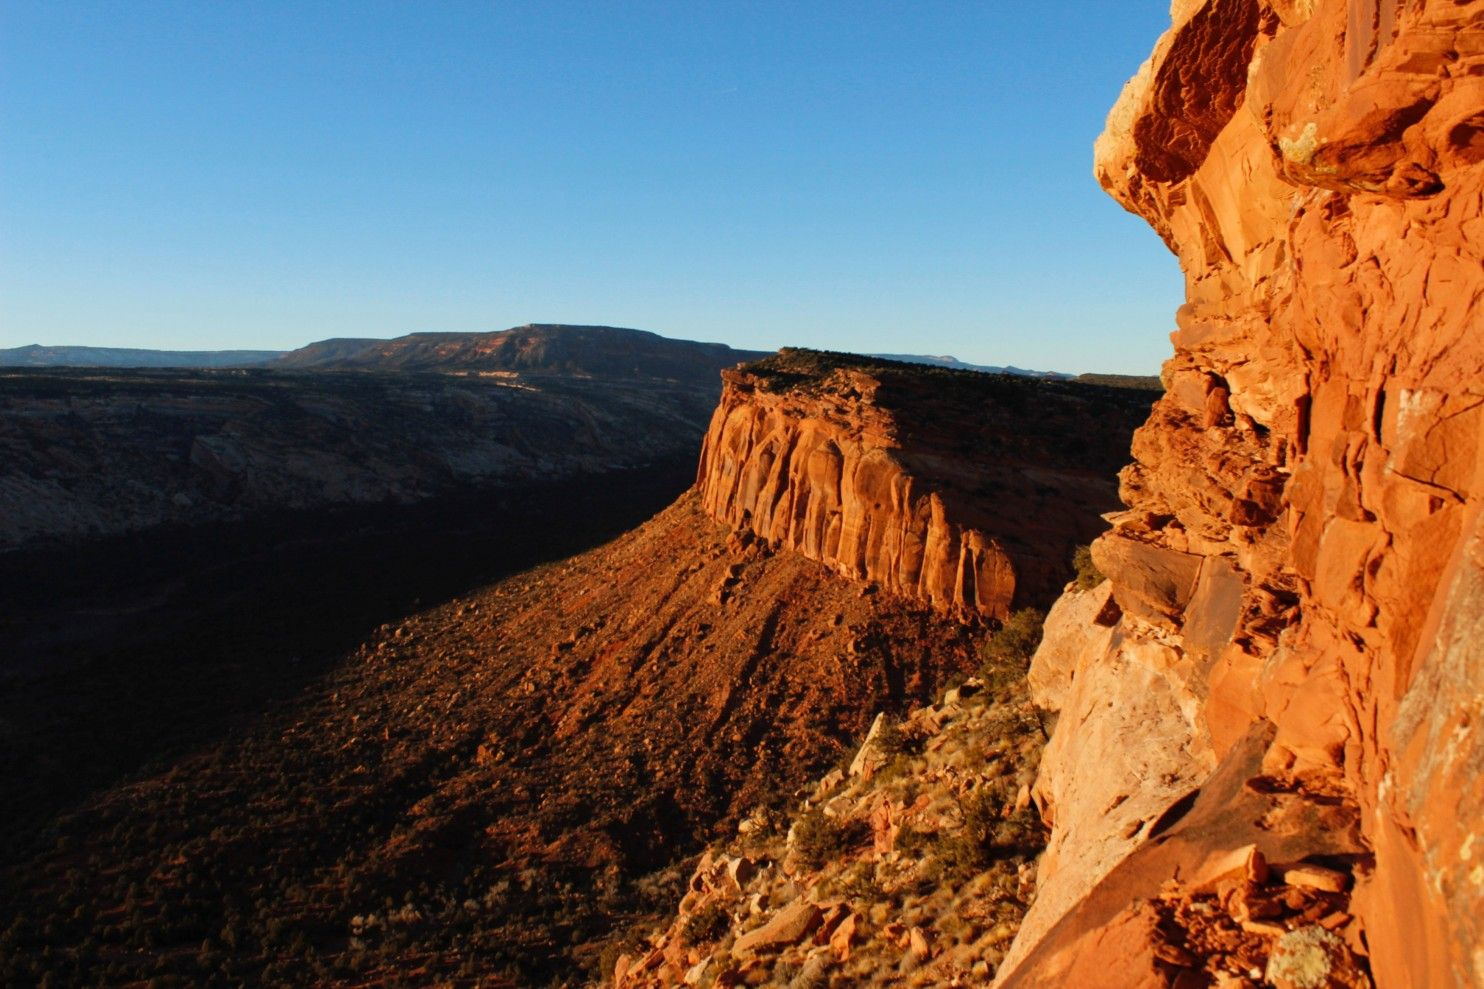 Citing tweet, Chaffetz asks whether Bryce Canyon officials